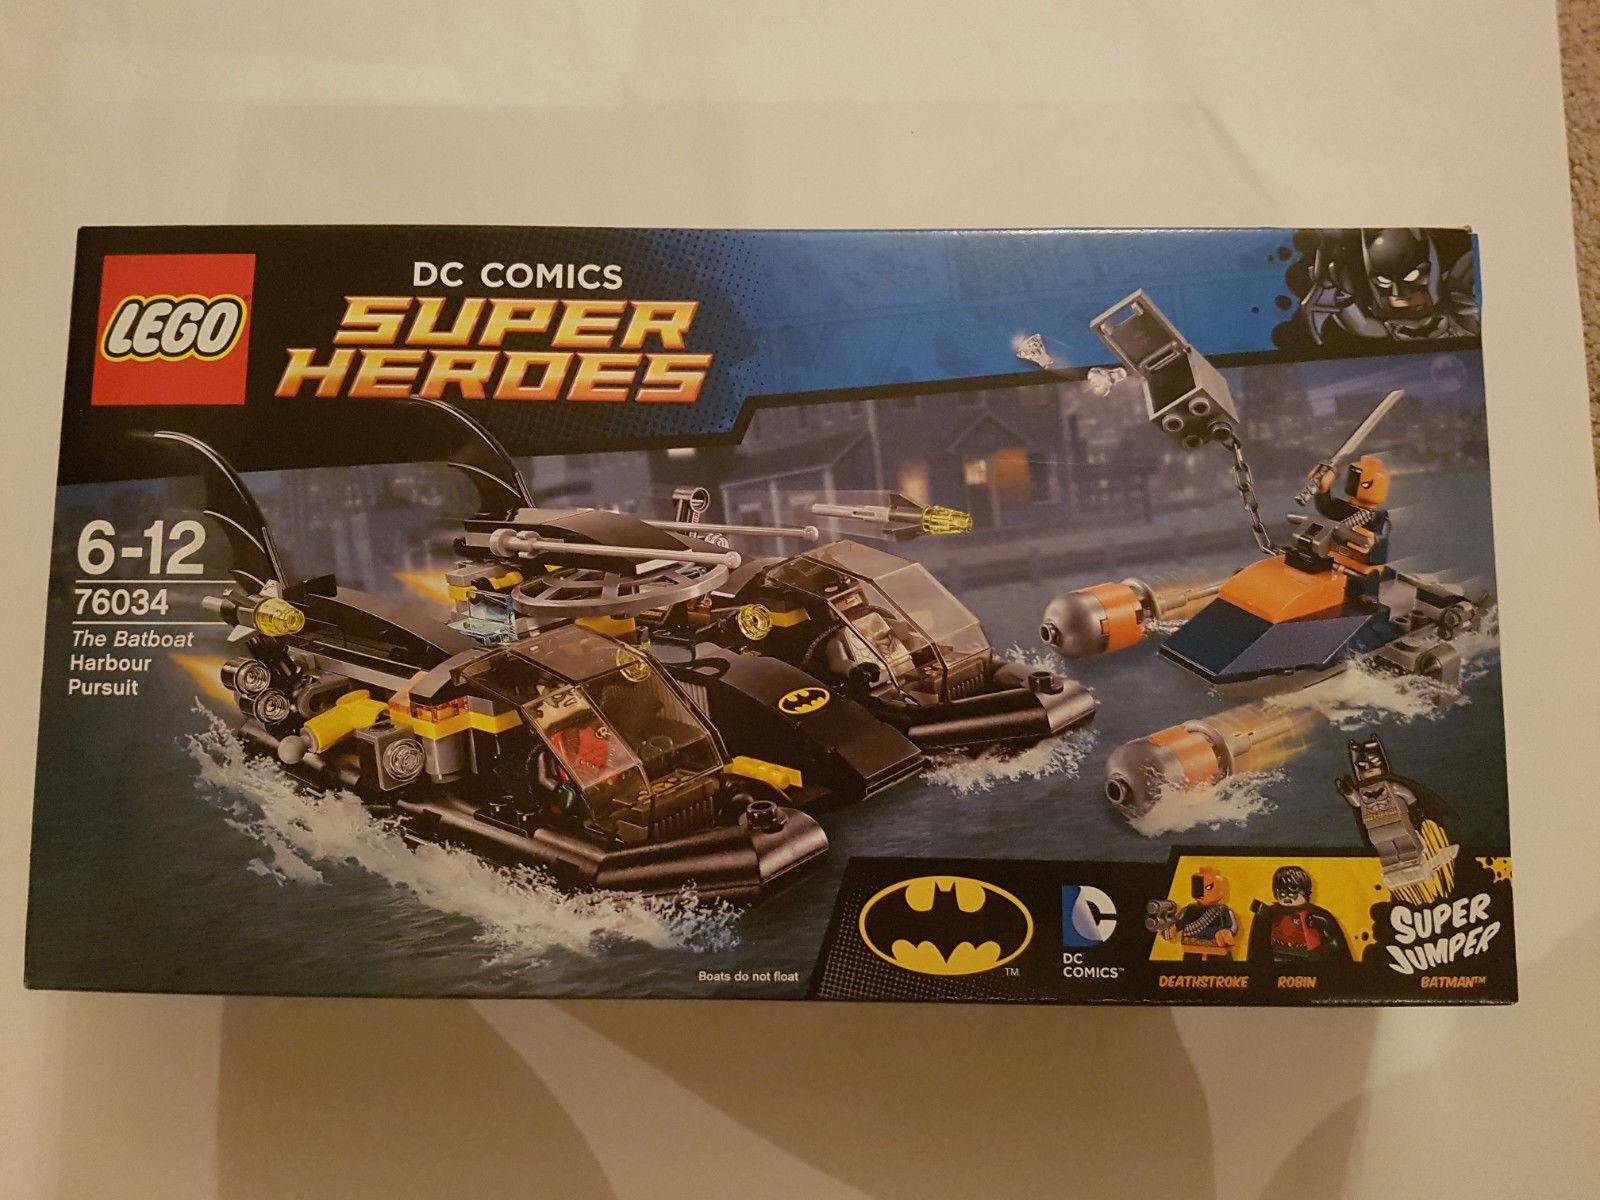 LEGO DC COMICS SUPER HEROES-LA batboat Harbour Pursuit (76034) - Nuovo di Zecca